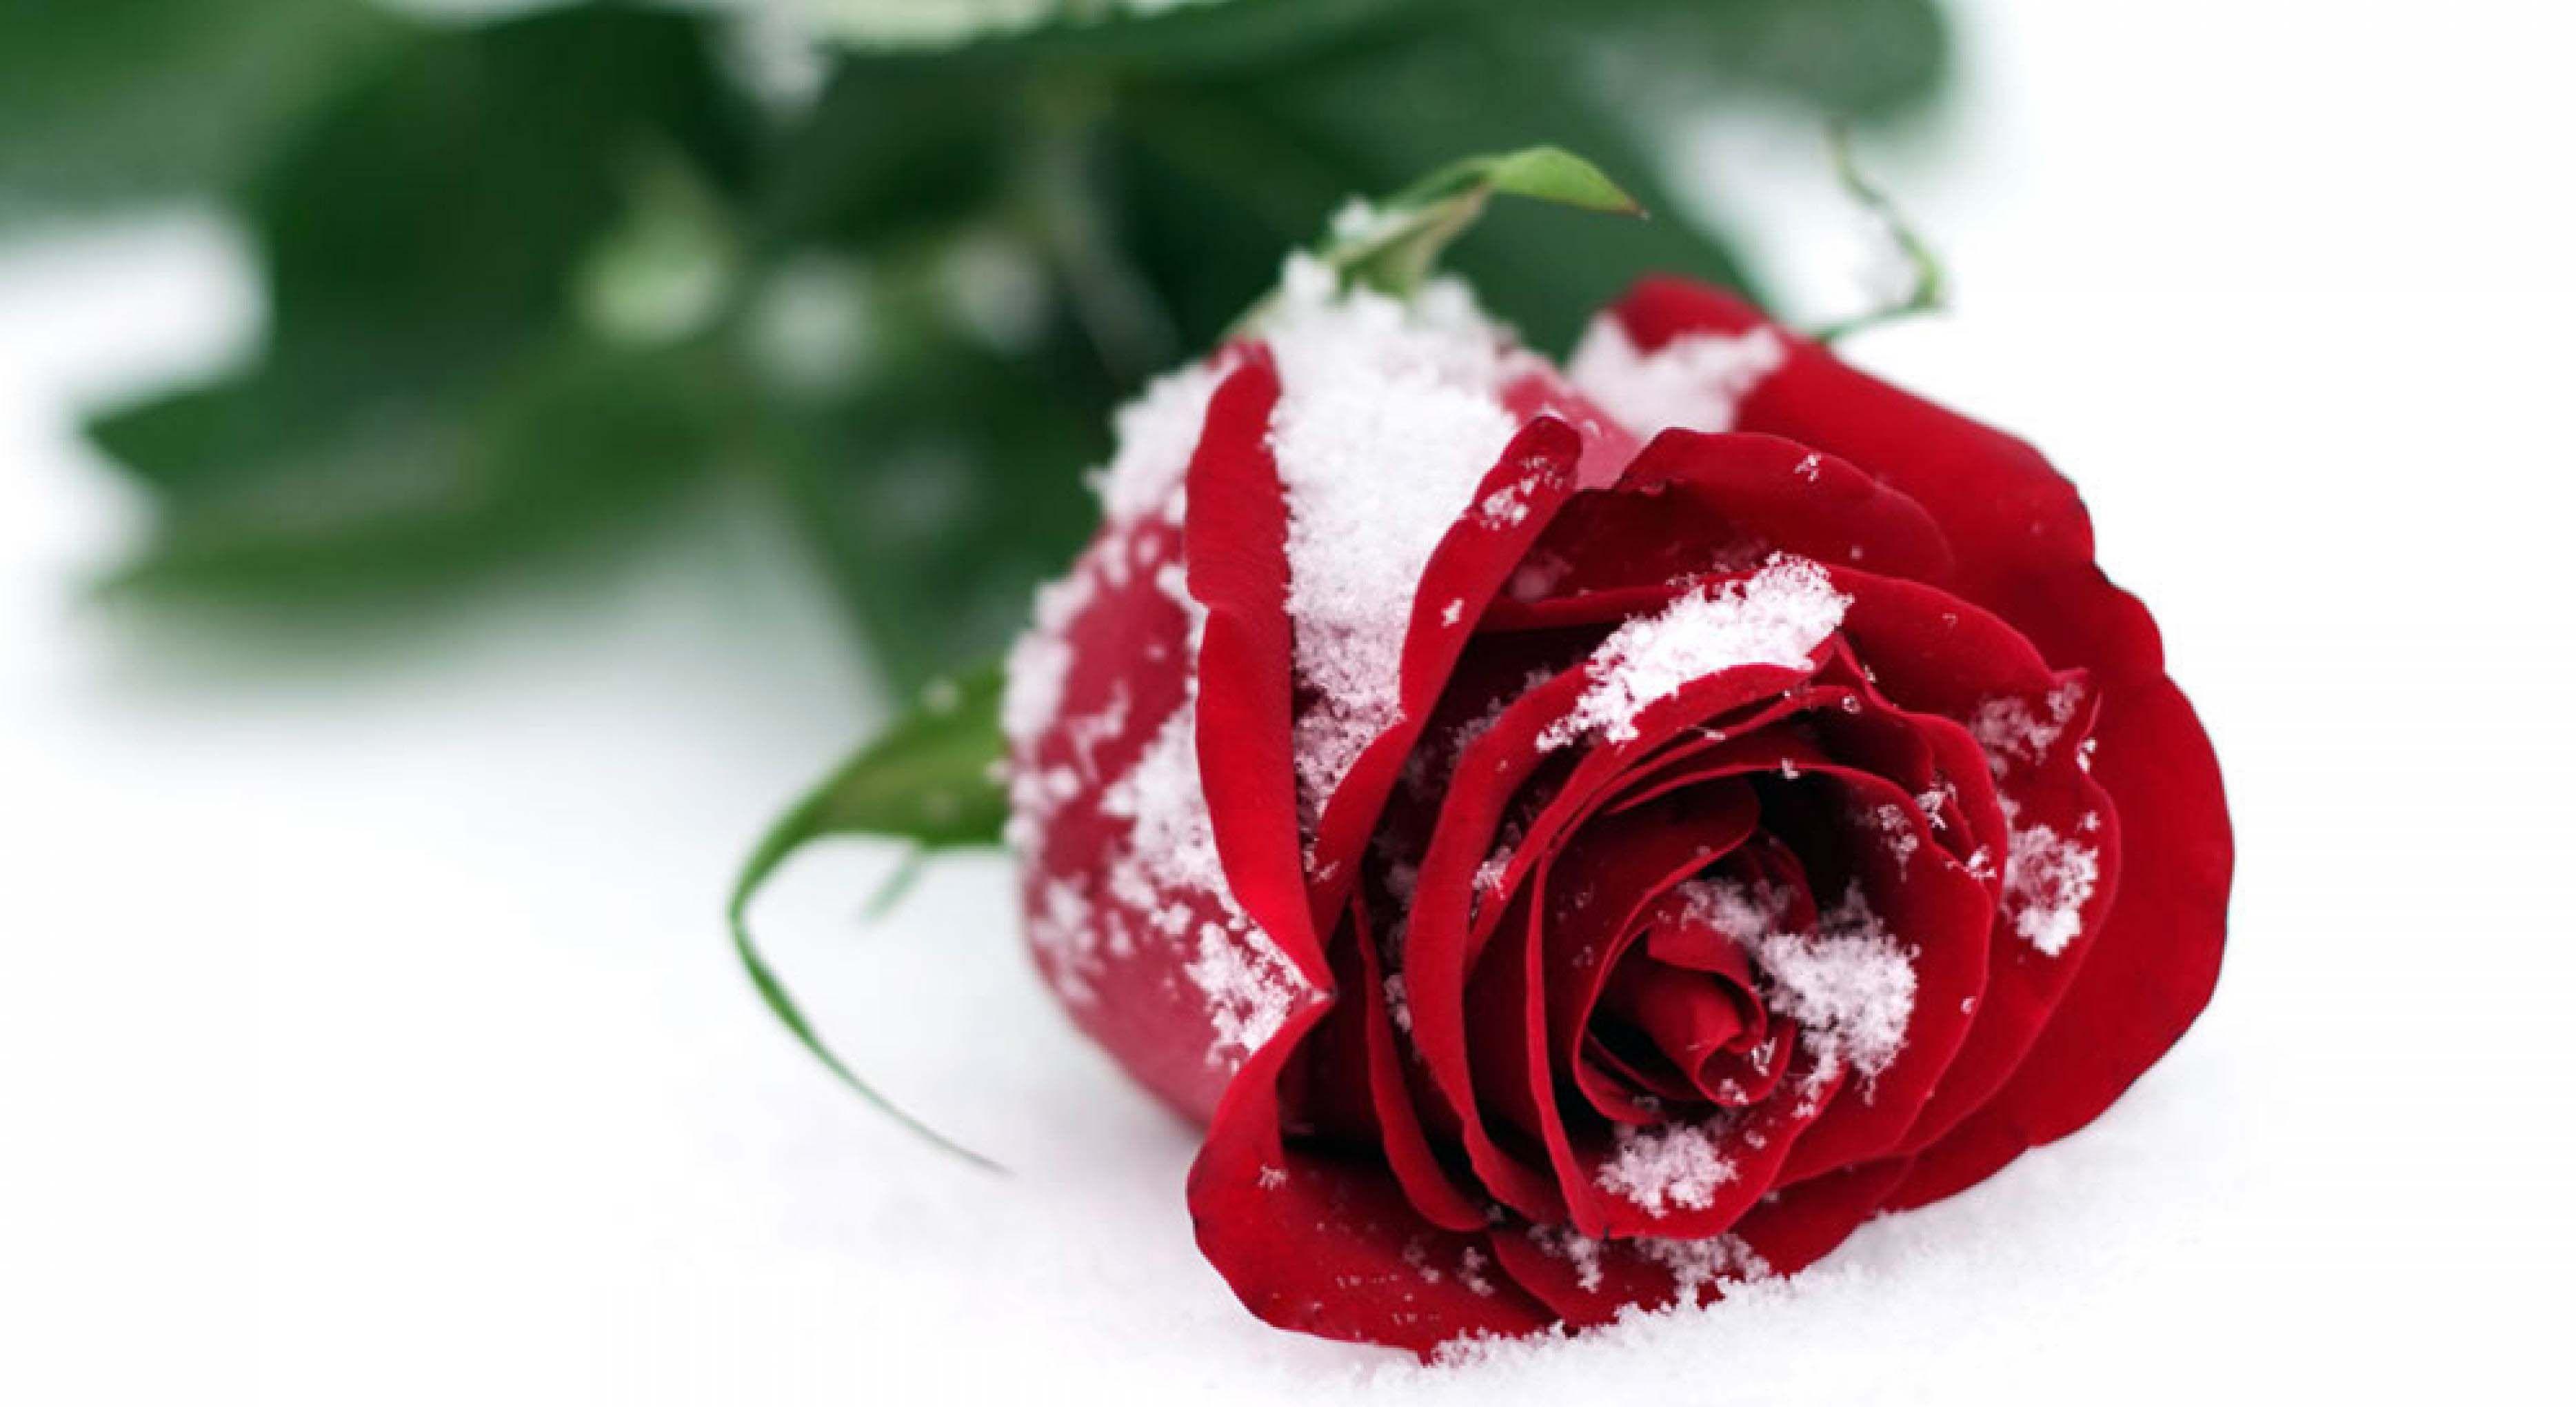 Winter Snow Rose Images Hd Desktop Wallpapers Snow Rose Rose Flower Wallpaper Rose Images